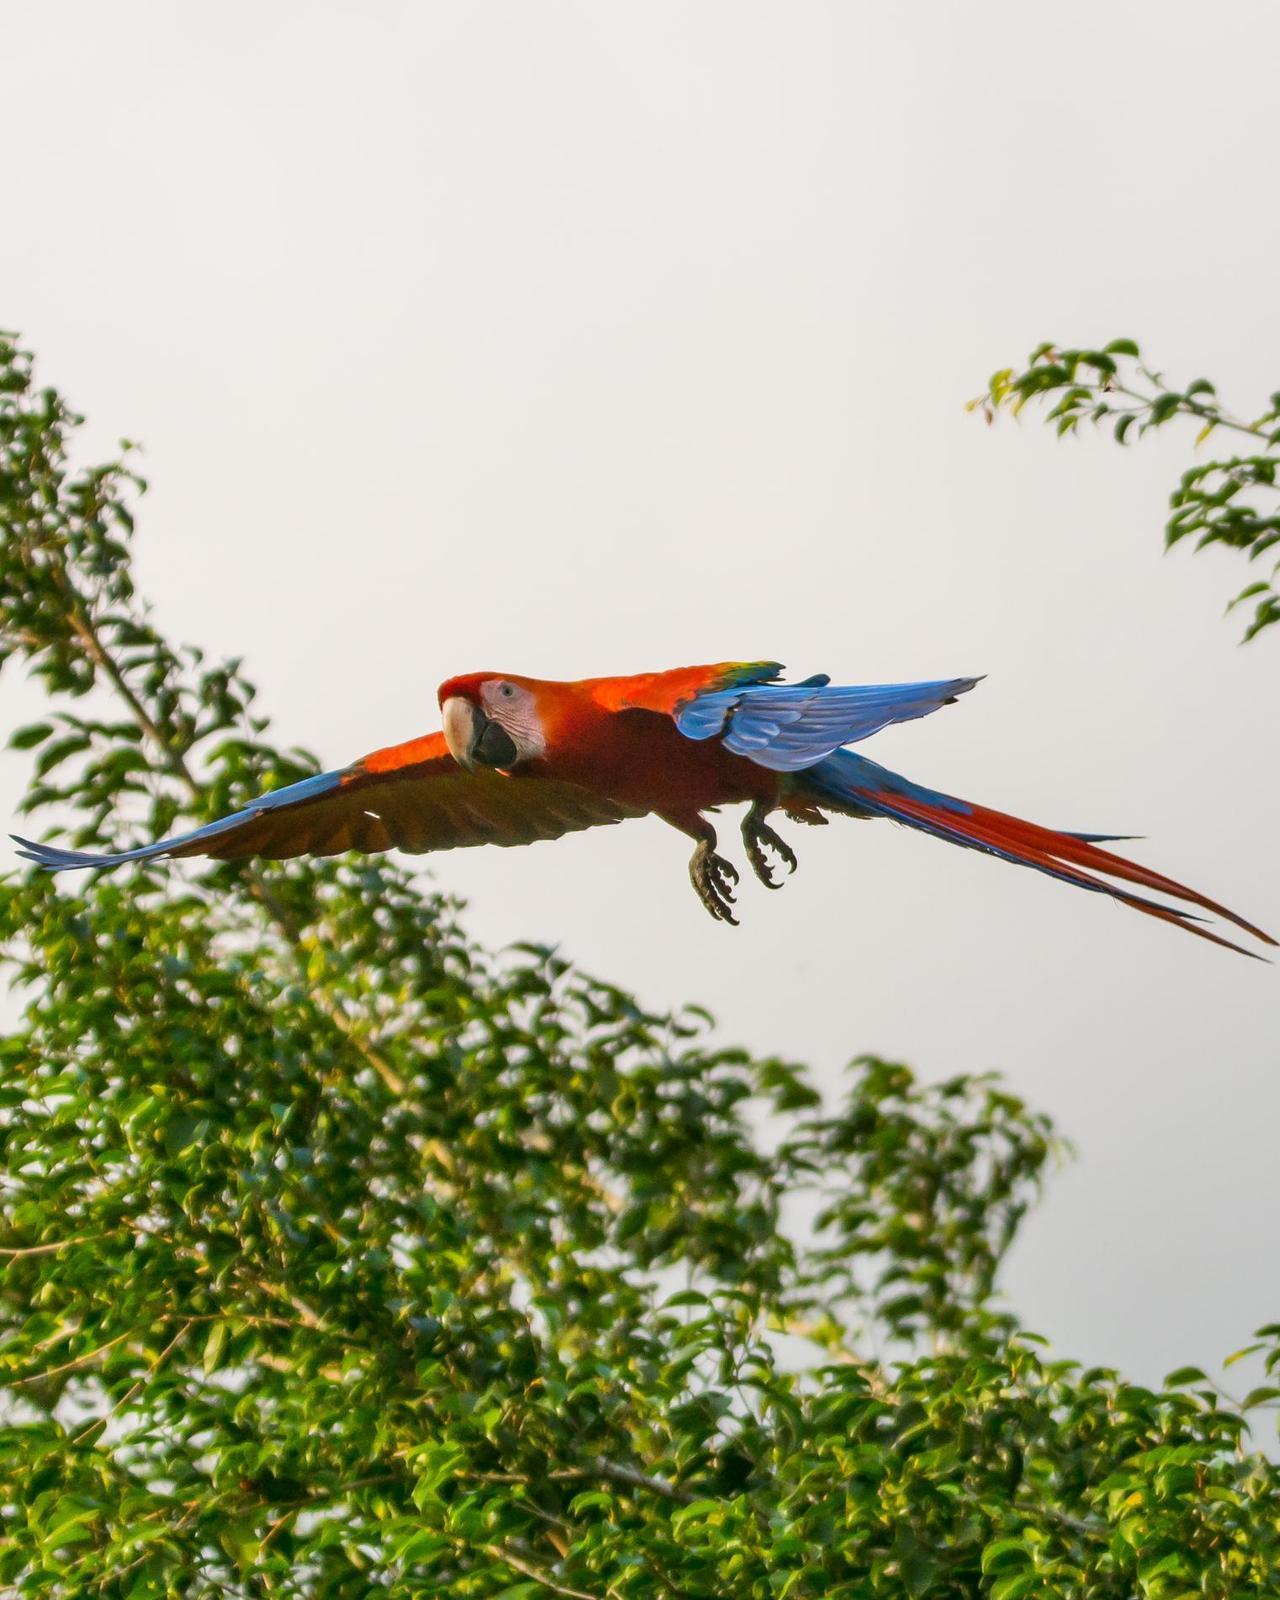 Scarlet Macaw Photo by Gerald Hoekstra